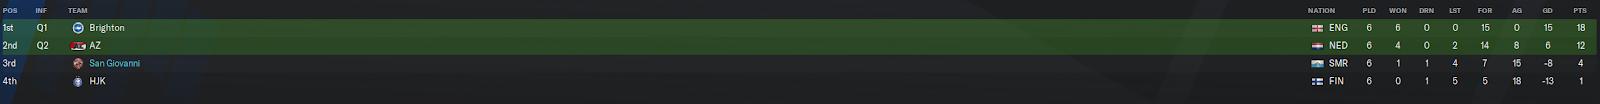 26-27 Euro League.PNG